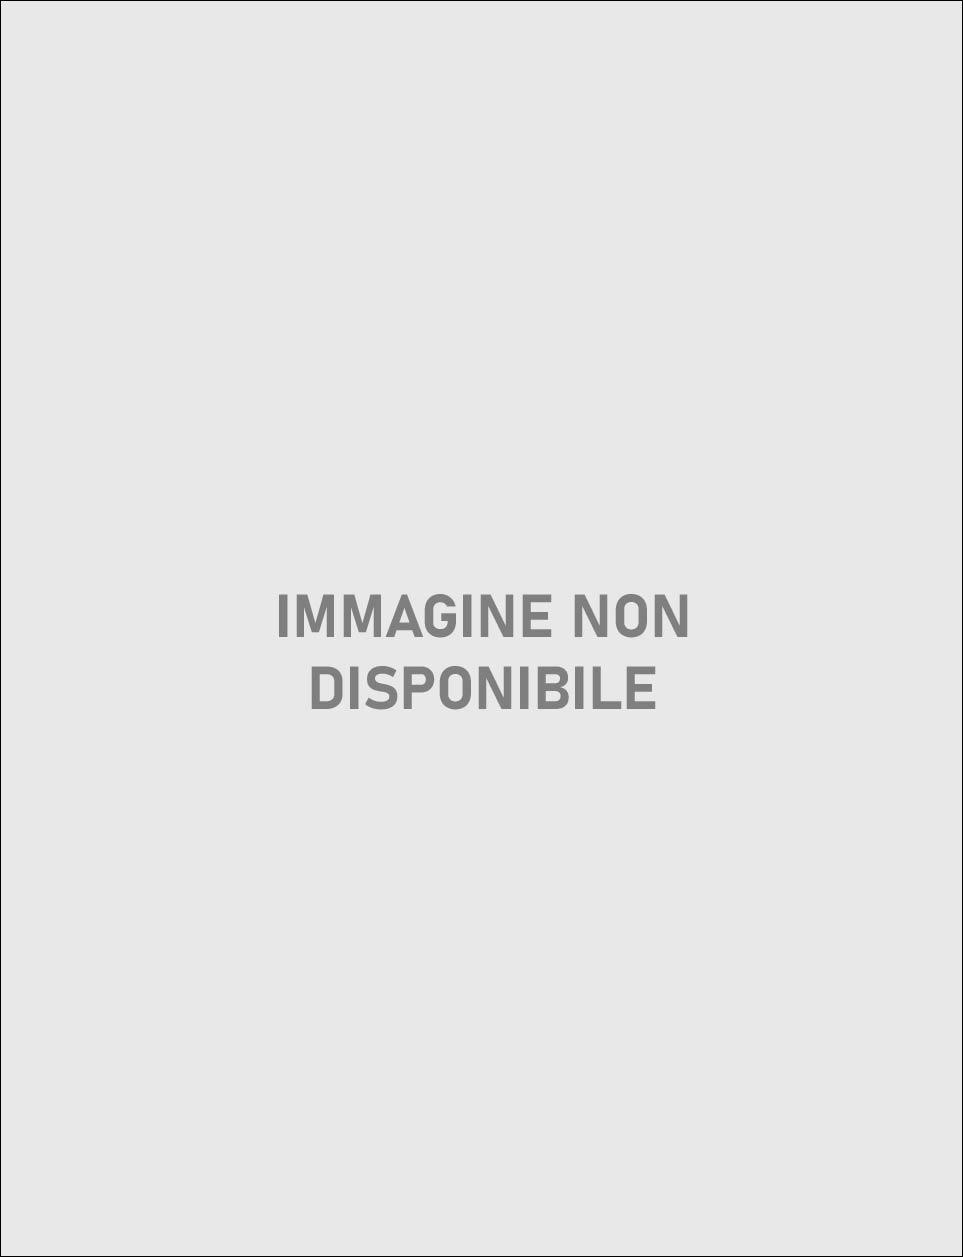 T-shirt lunga casualcoloreBianco